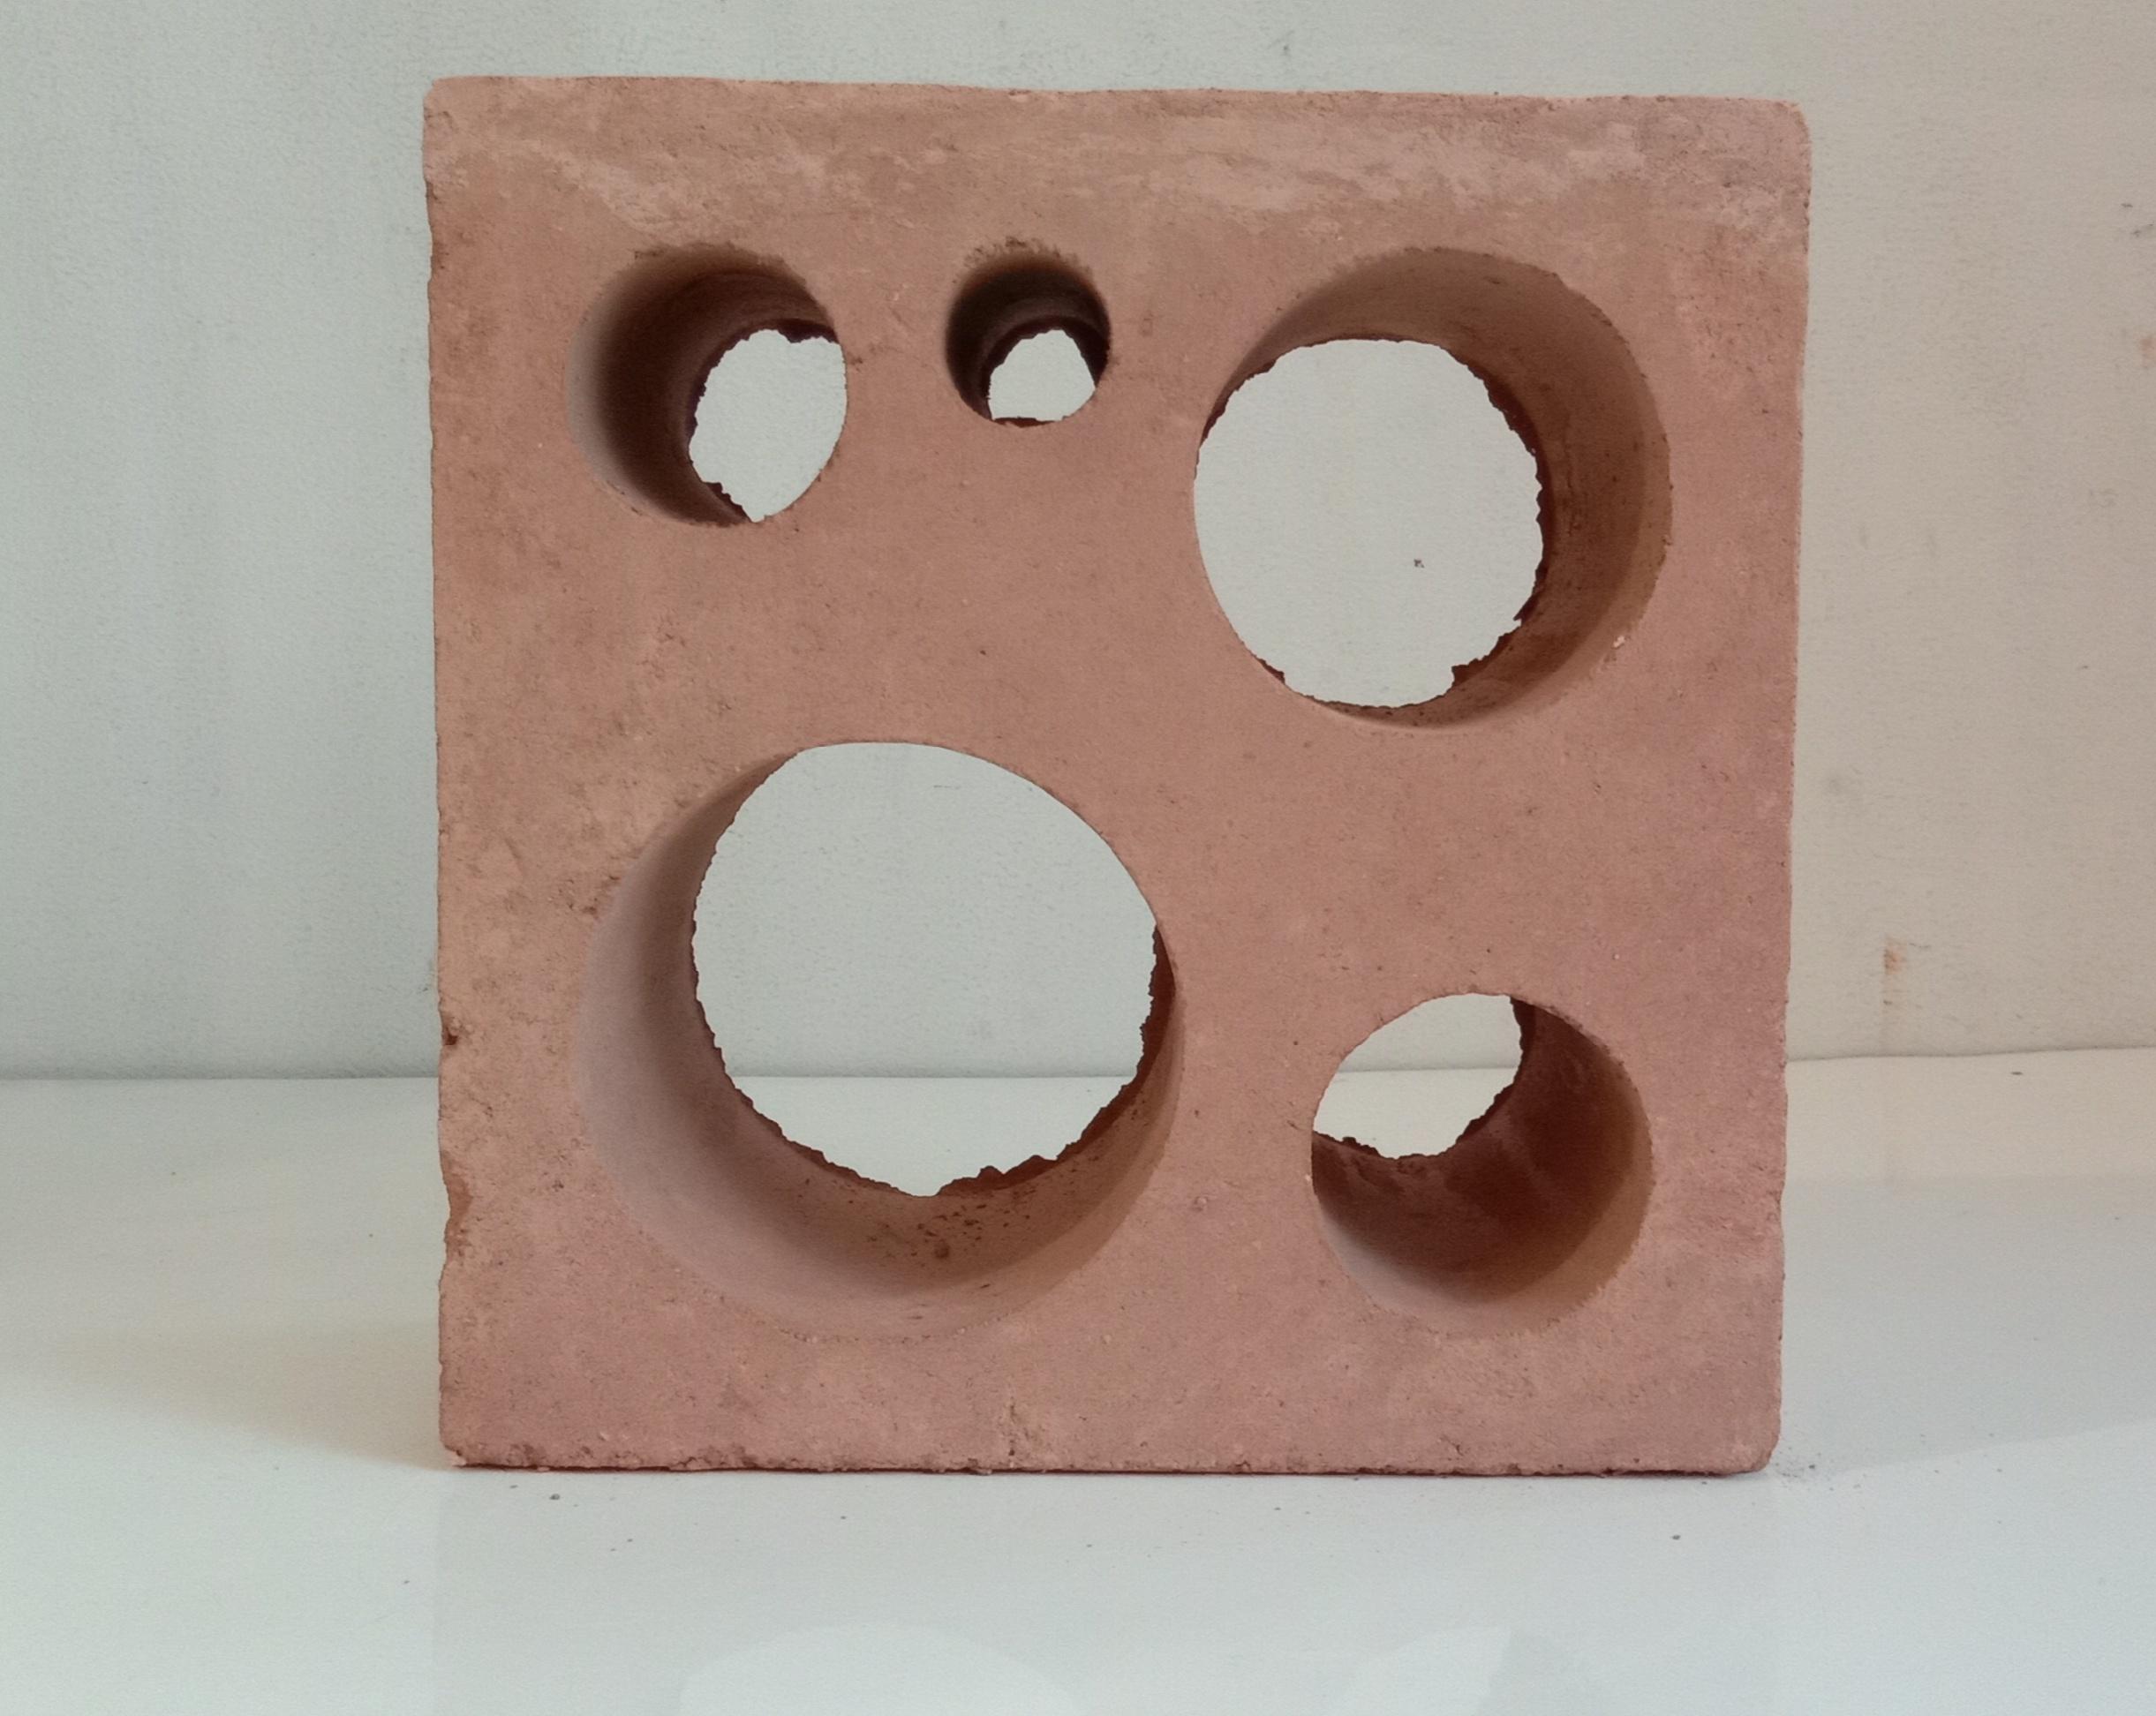 Roster Terakota Holes